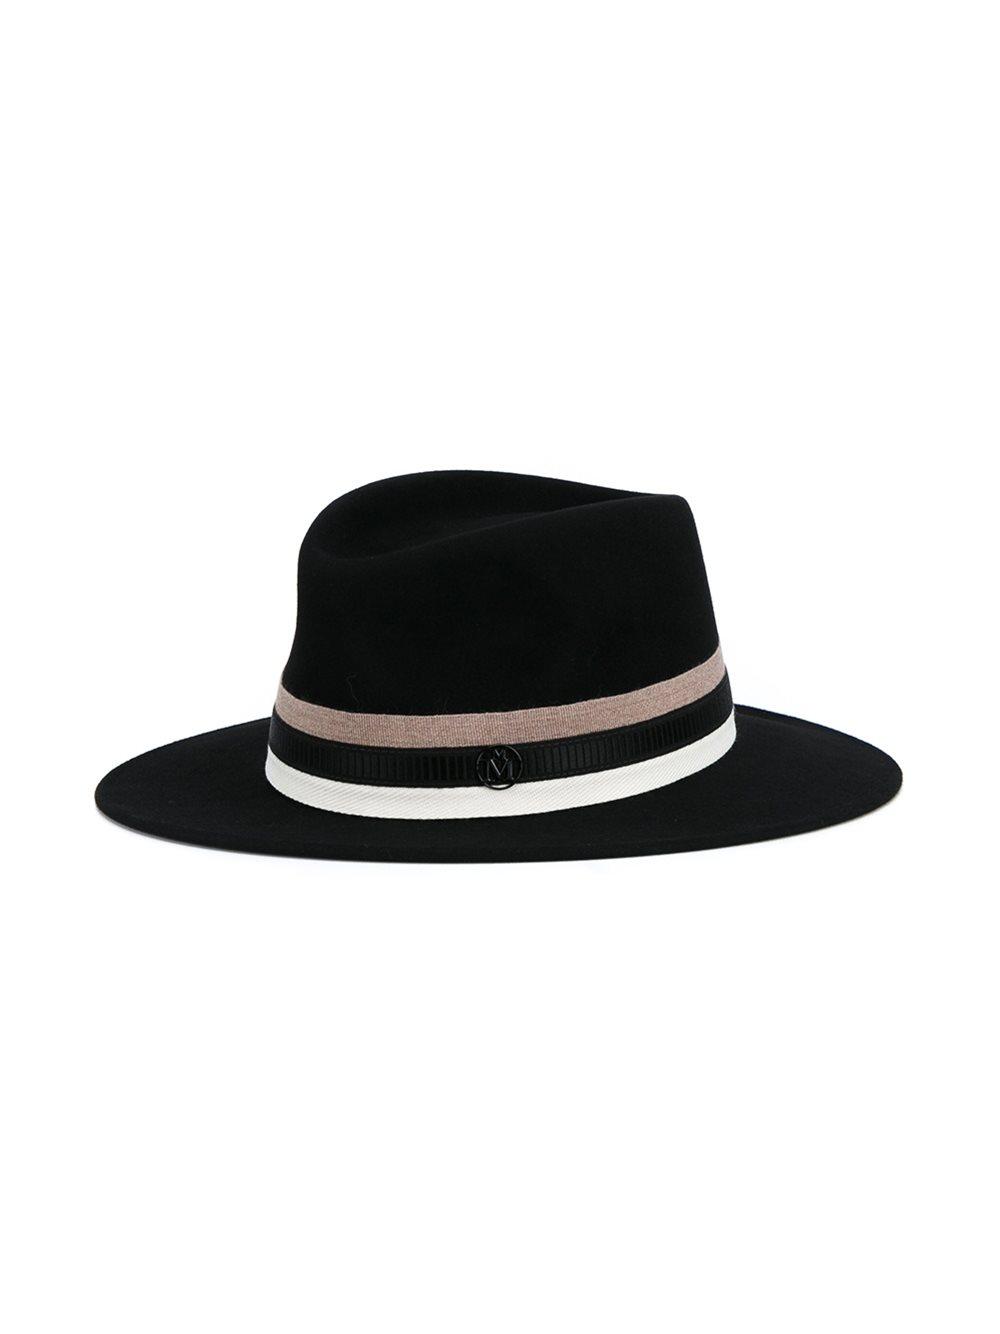 Maison Michel 'Thadee' trilby hat.jpg